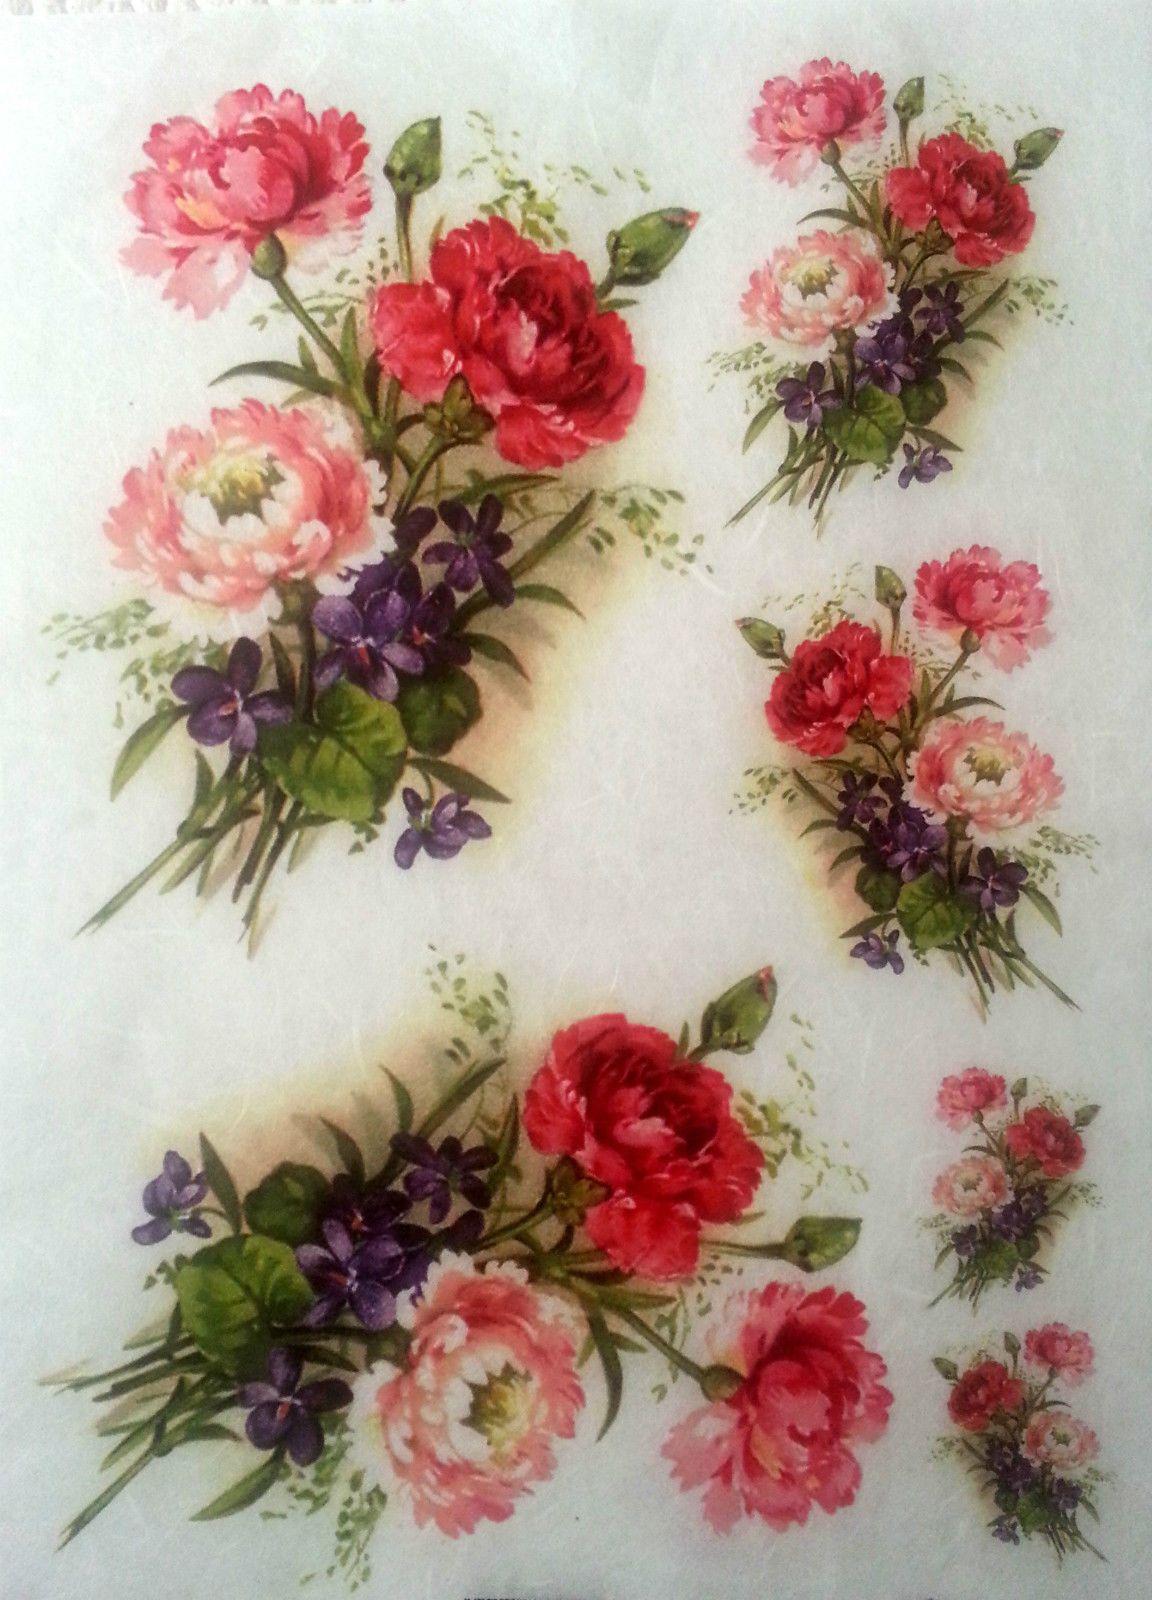 165 Gbp Rice Decoupage Paper Flowers 5 Decoupage Sheets